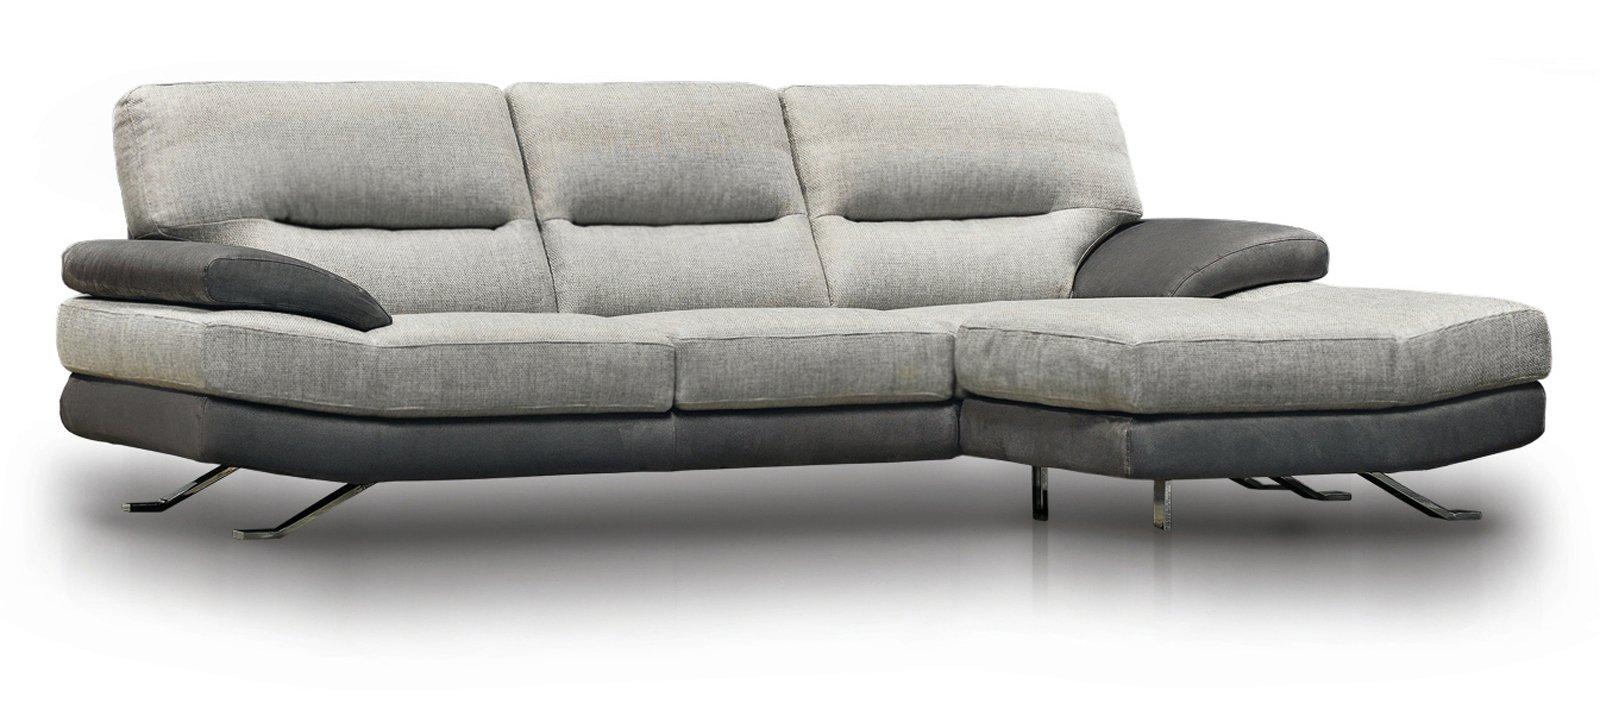 Design Duemila Divani Prezzi.Divani Da 200 A 2000 Euro Cose Di Casa